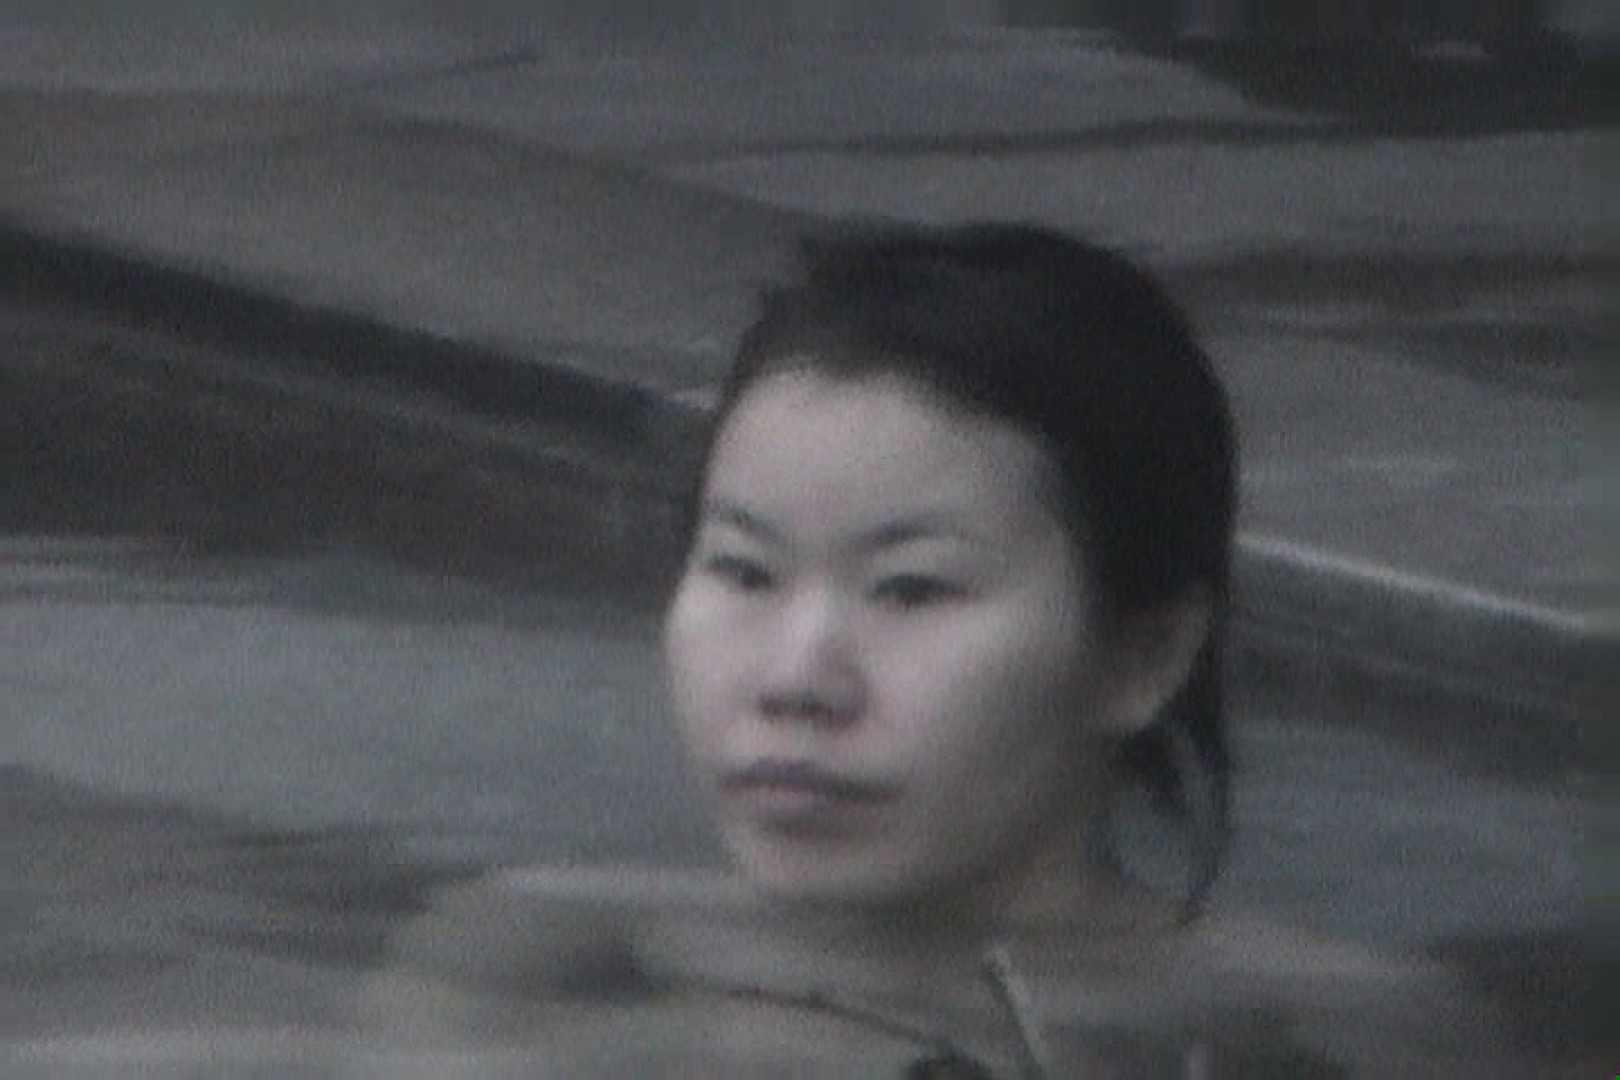 Aquaな露天風呂Vol.556 露天風呂編 | 盗撮シリーズ  99PIX 15